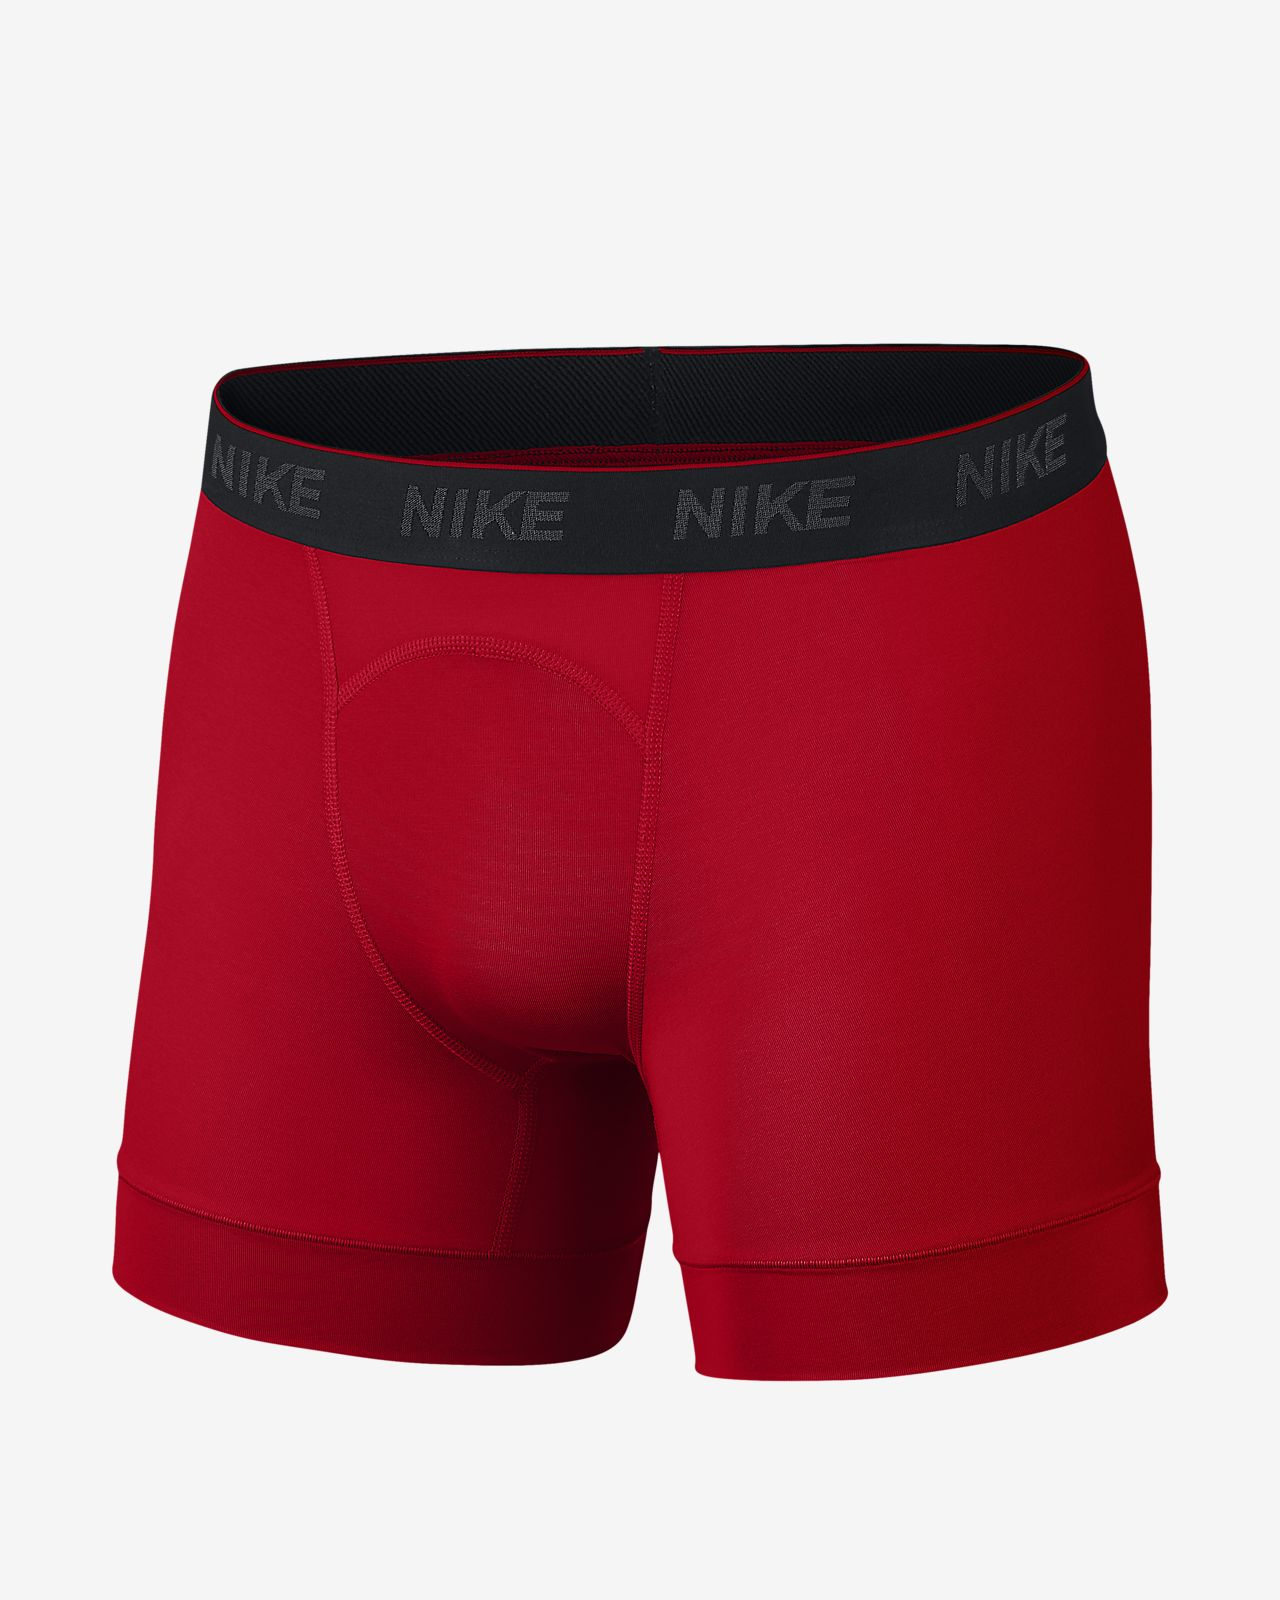 Nike Men's Training Boxer Briefs (2 Pack)